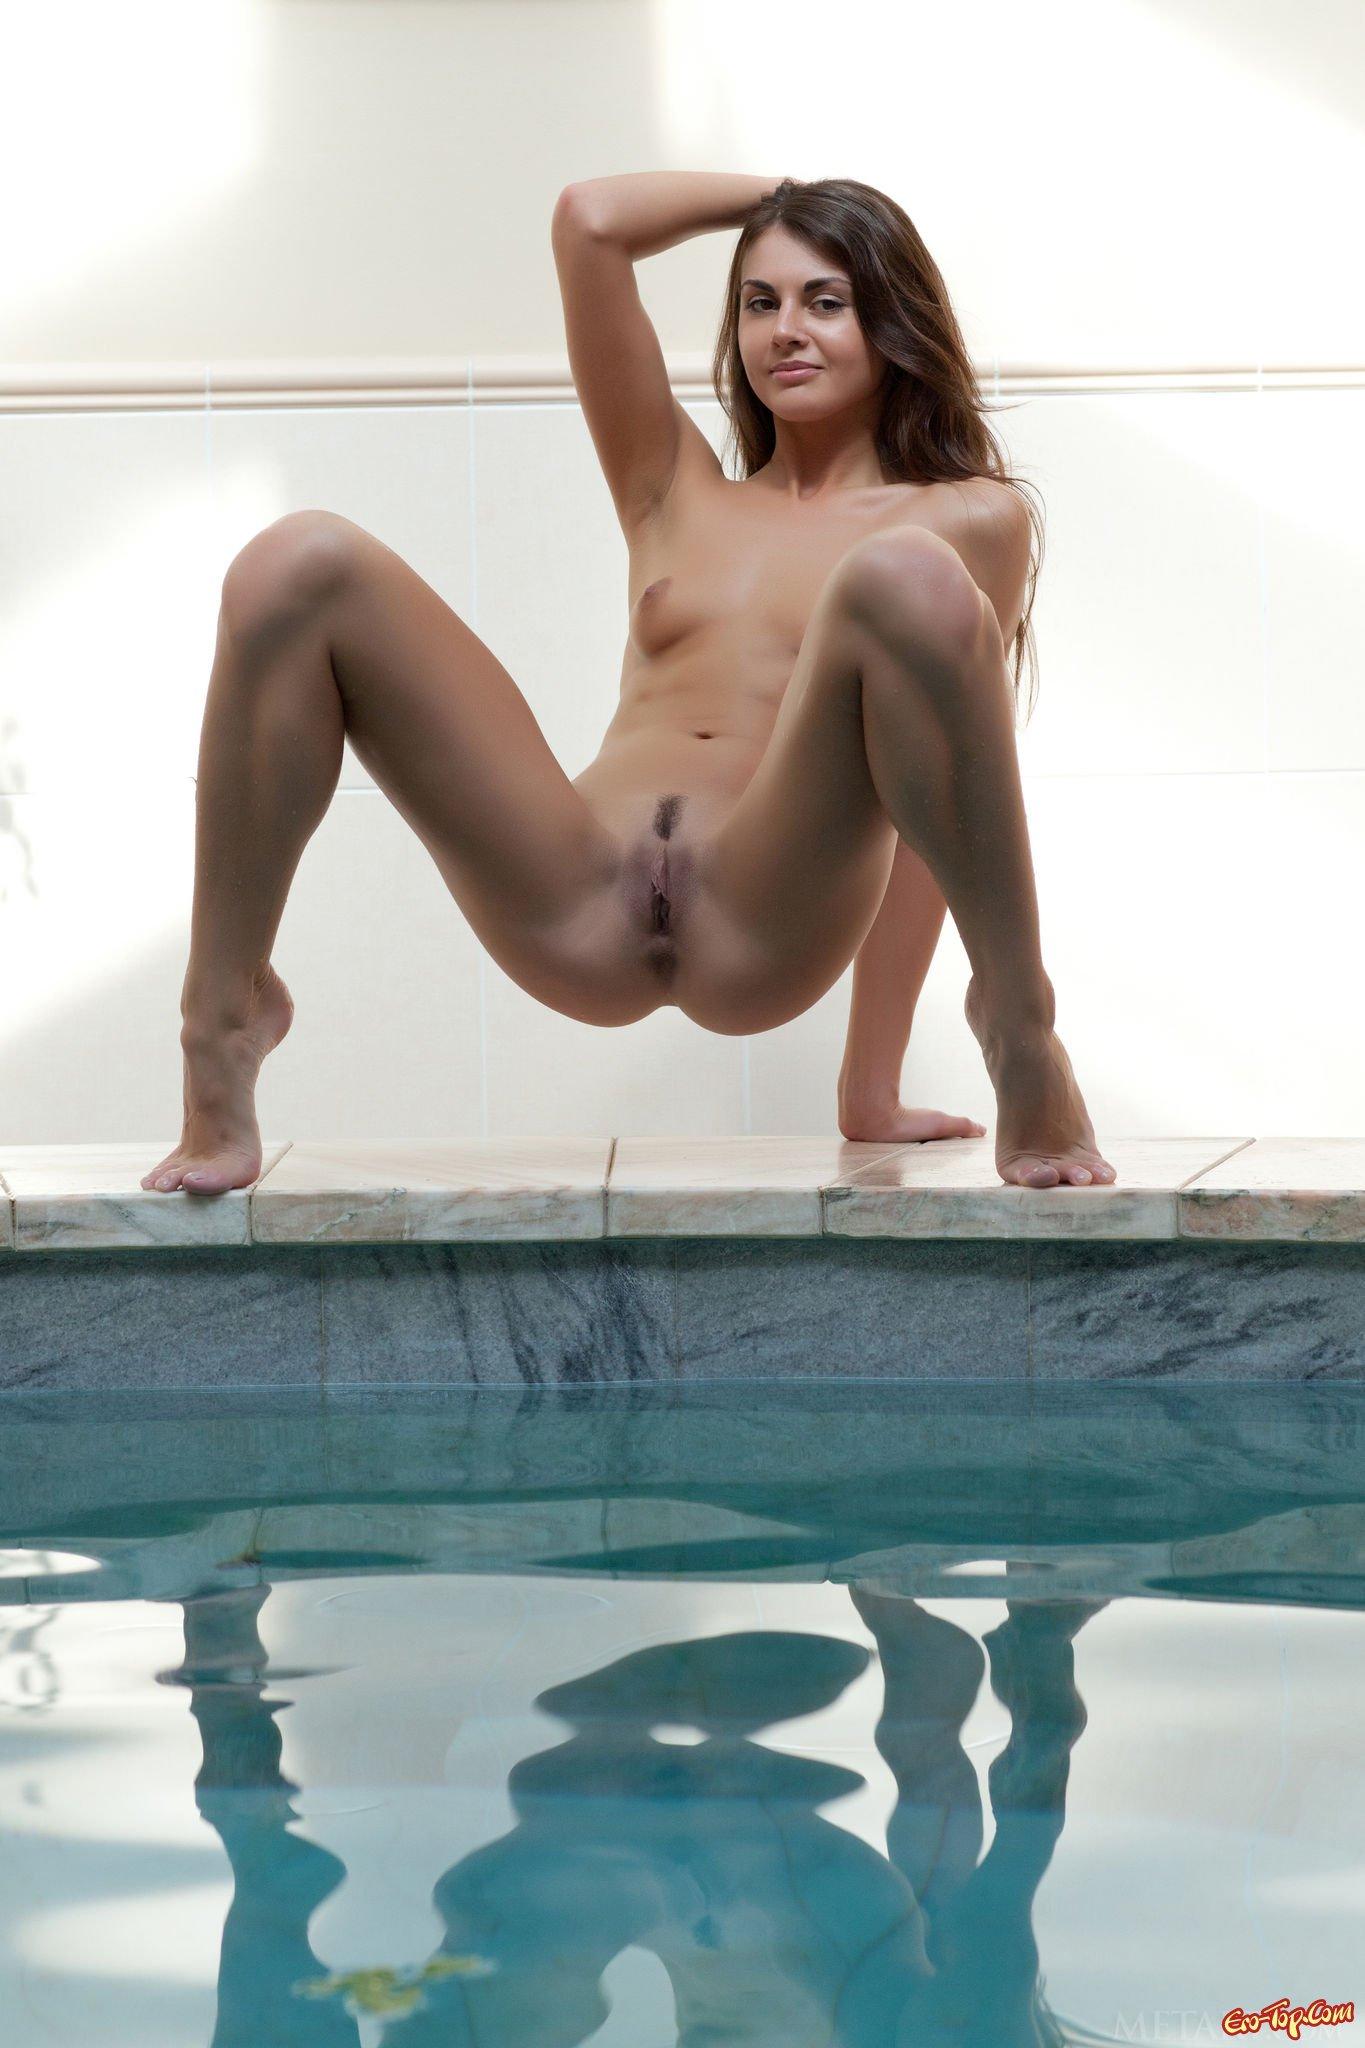 Красавица у бассейна